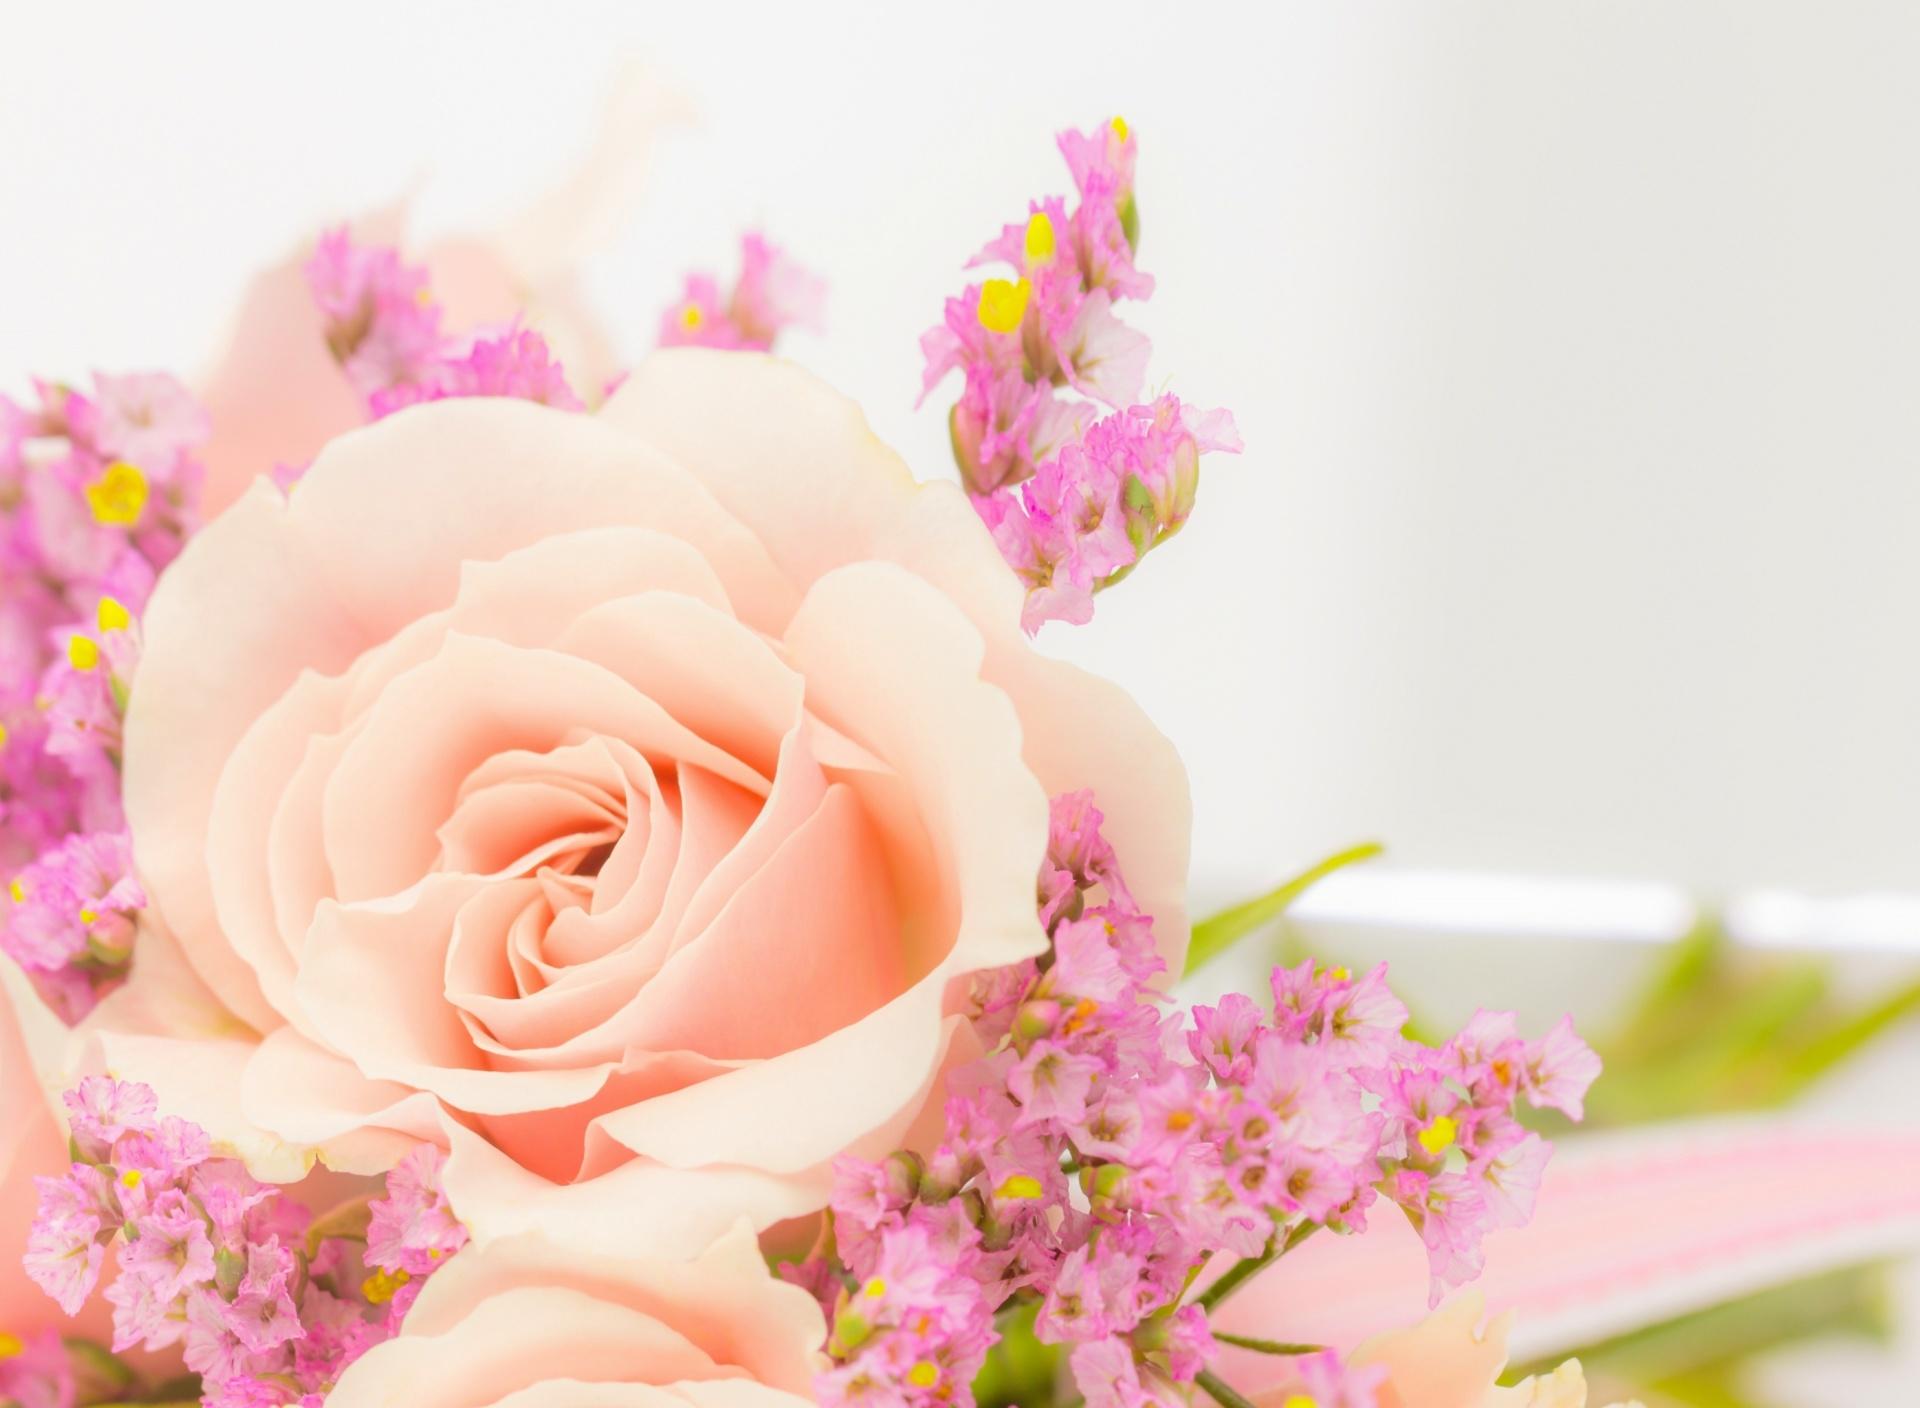 Хабиба нурмагомедова, картинки нежных цветов